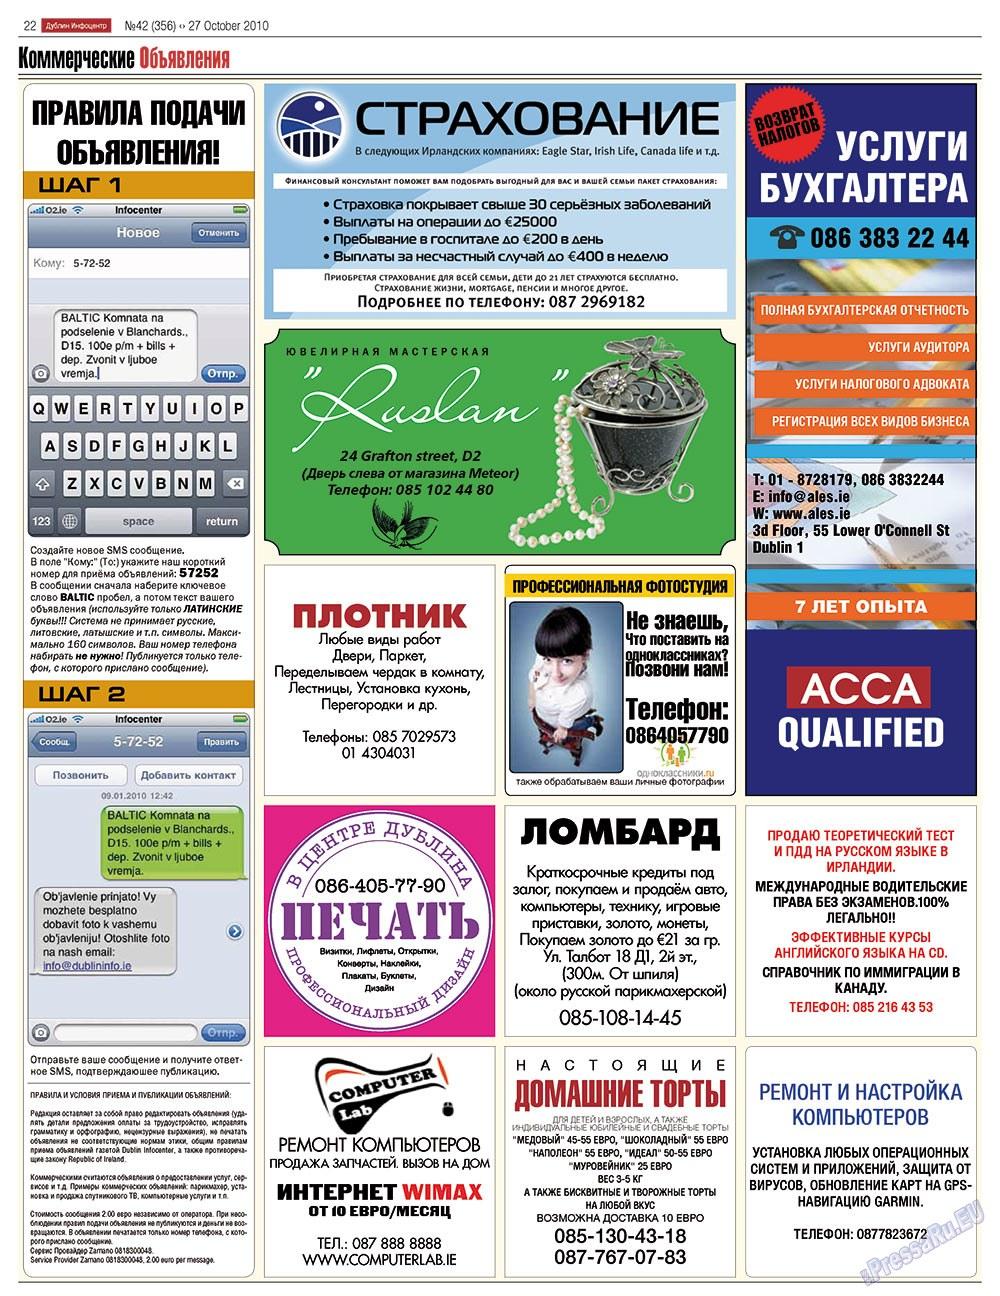 Дублин инфоцентр (газета). 2010 год, номер 42, стр. 22